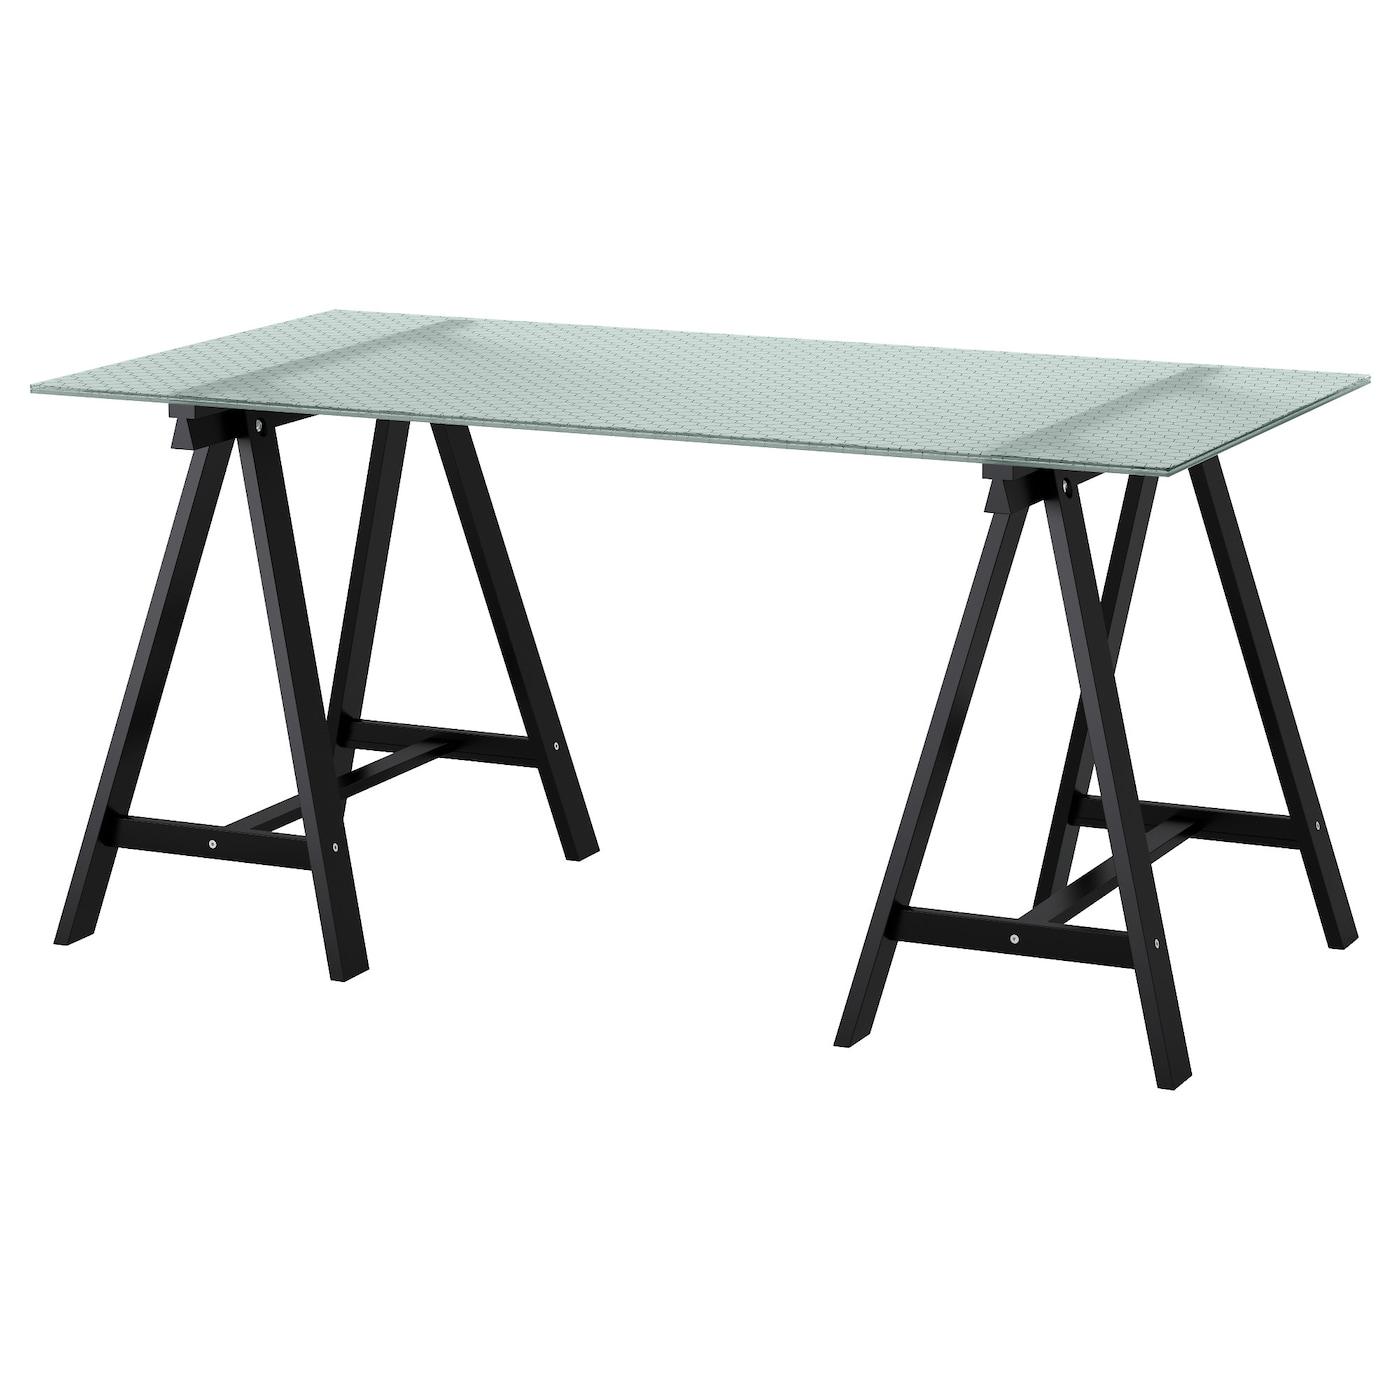 Glasholm oddvald mesa vidrio panal negro 148 x 73 cm ikea - Mesas de cristal ikea ...